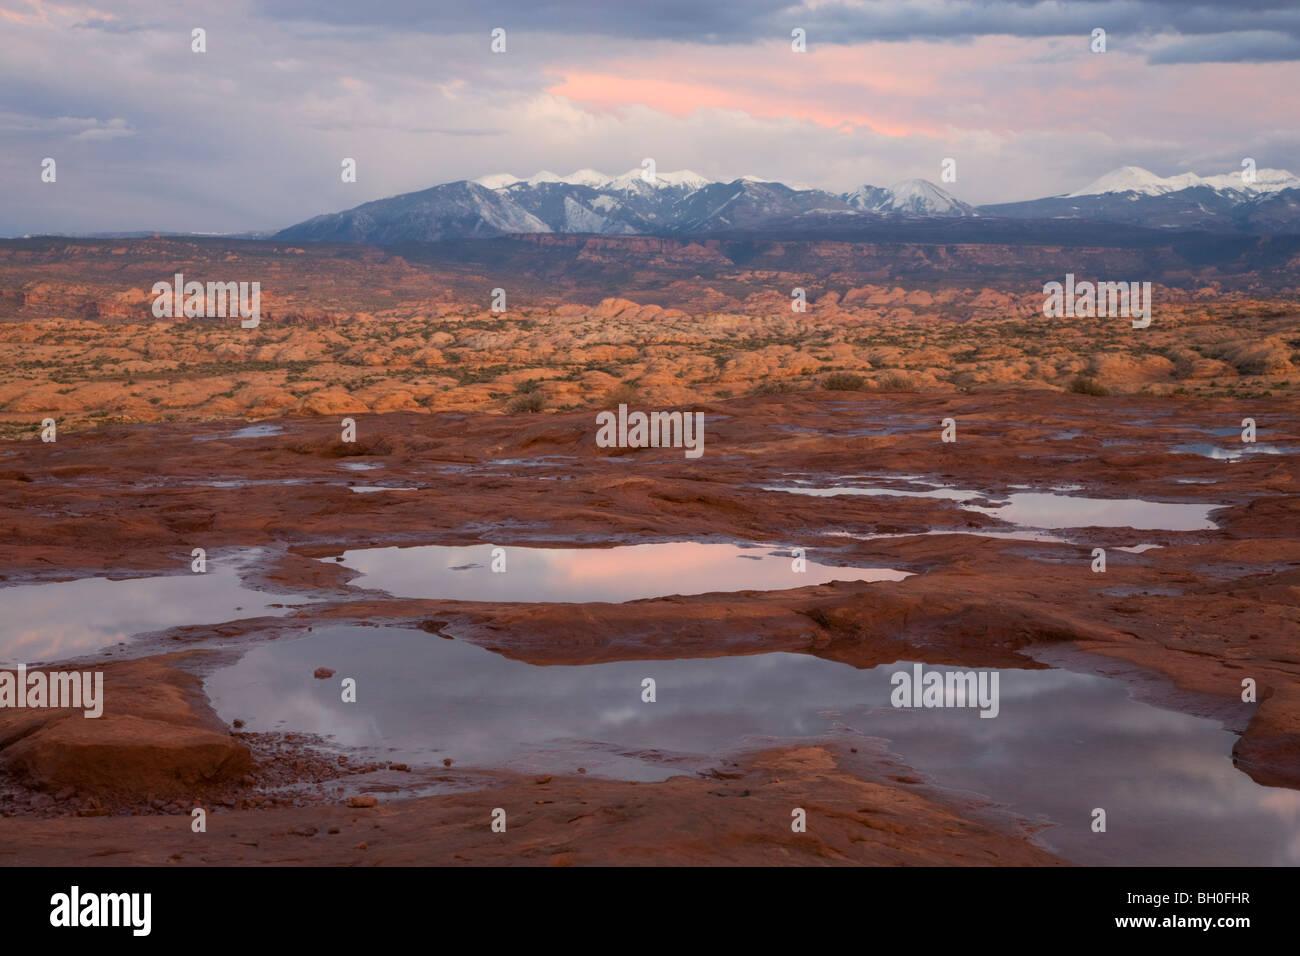 Potholes full of rain water, La Sal Mountains Viewpoint, Arches National Park, near Moab, Utah. - Stock Image